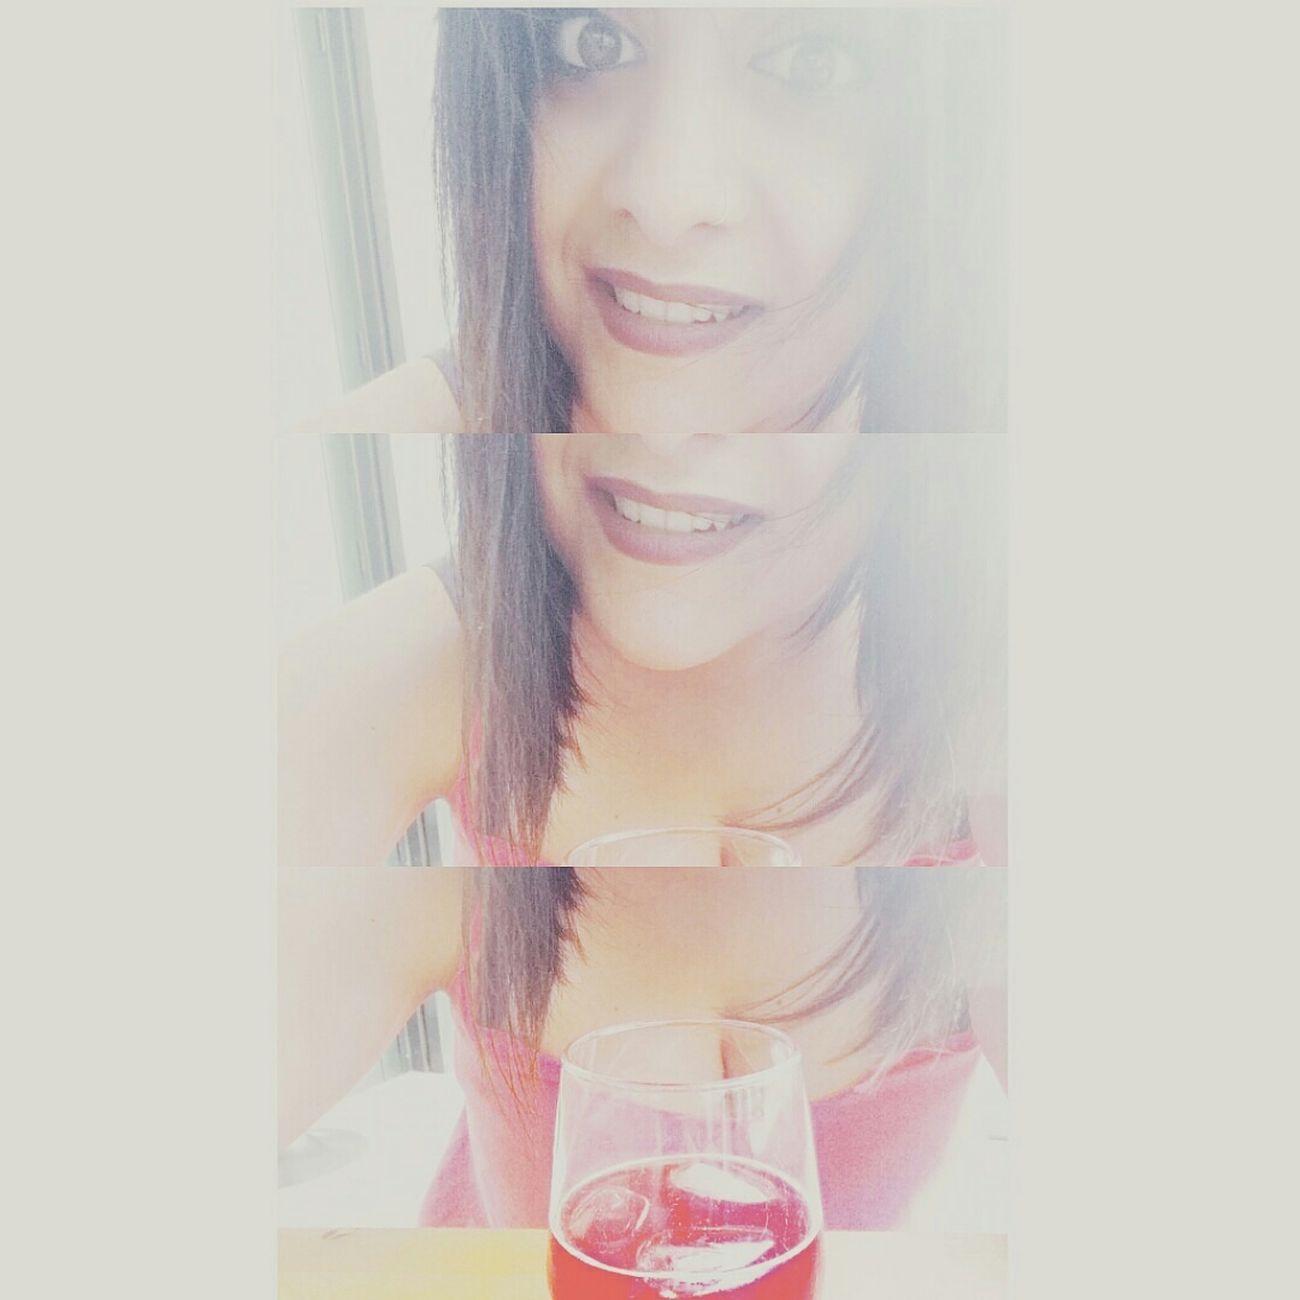 Alcool  Portrait Girl Photooftheday Followme Summer Selfie Model Campari EyeEm Best Shots